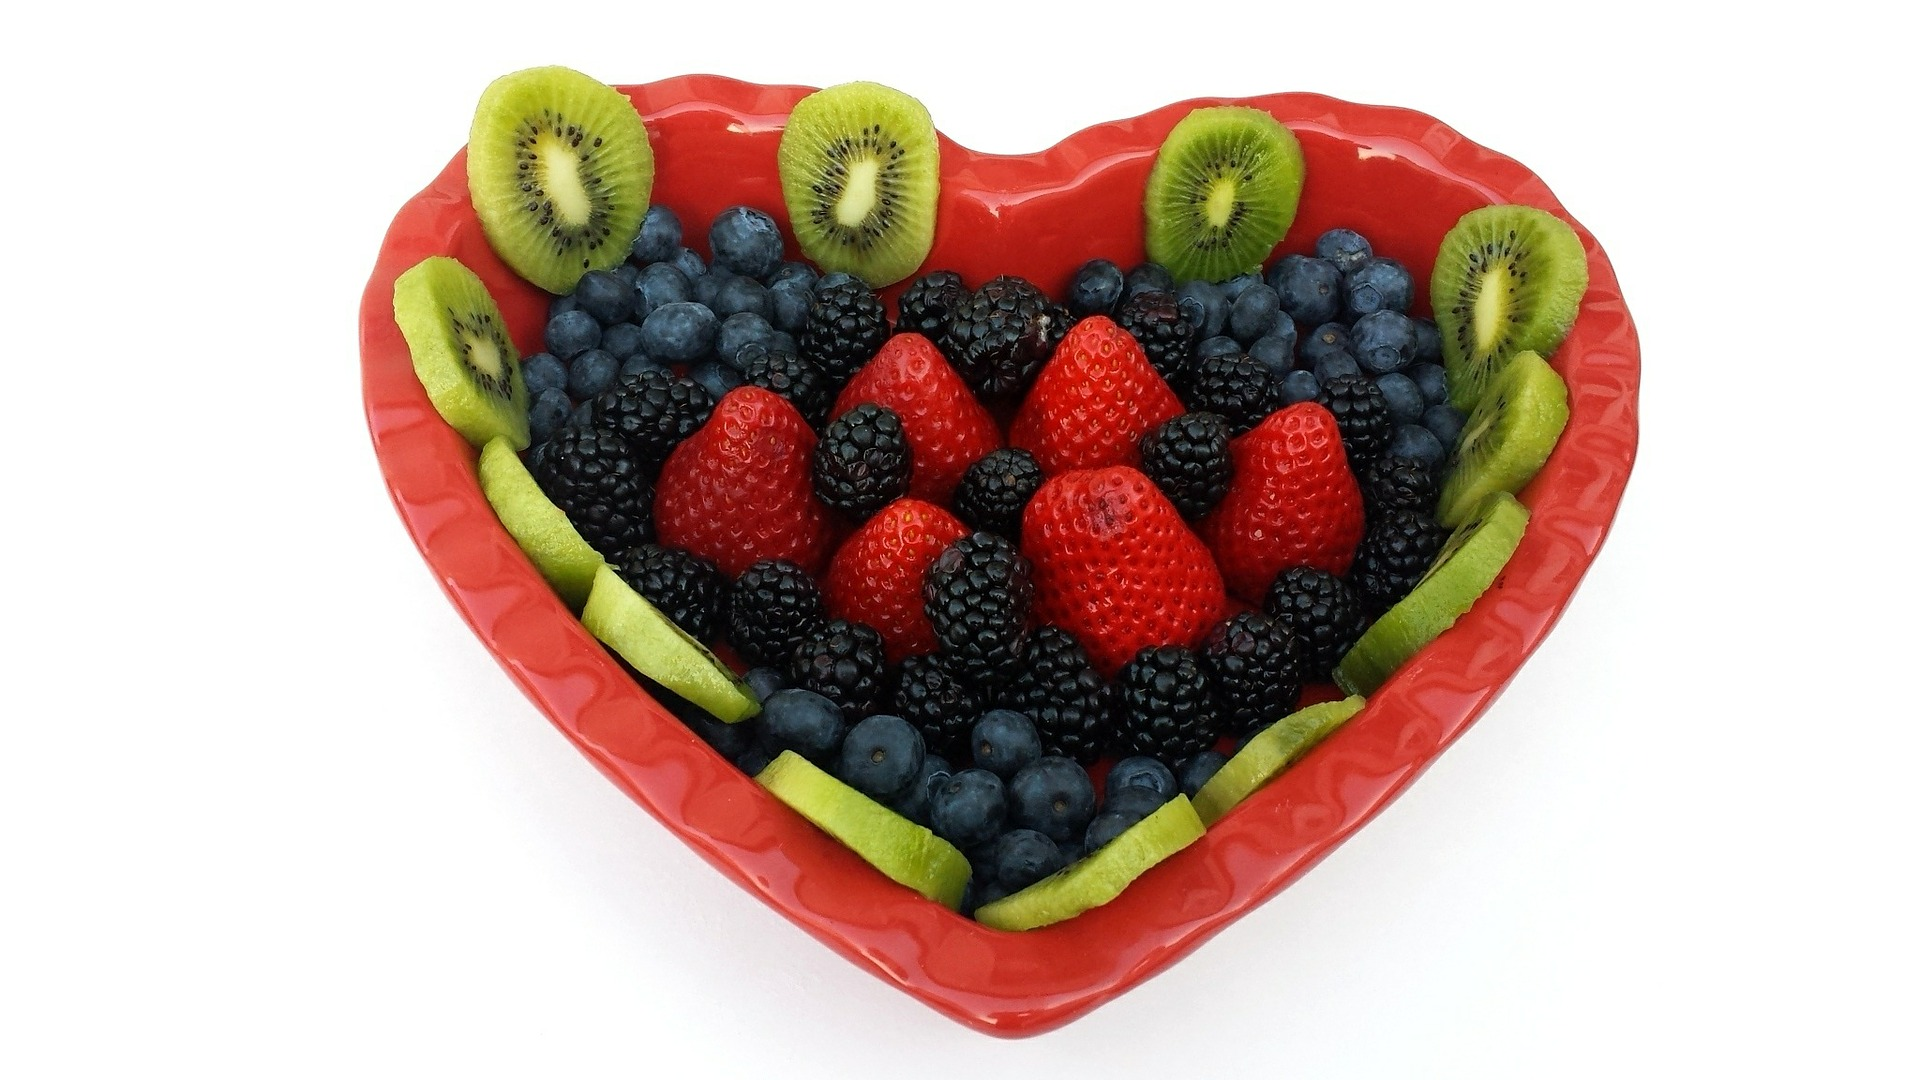 heart shapped healthy fruits